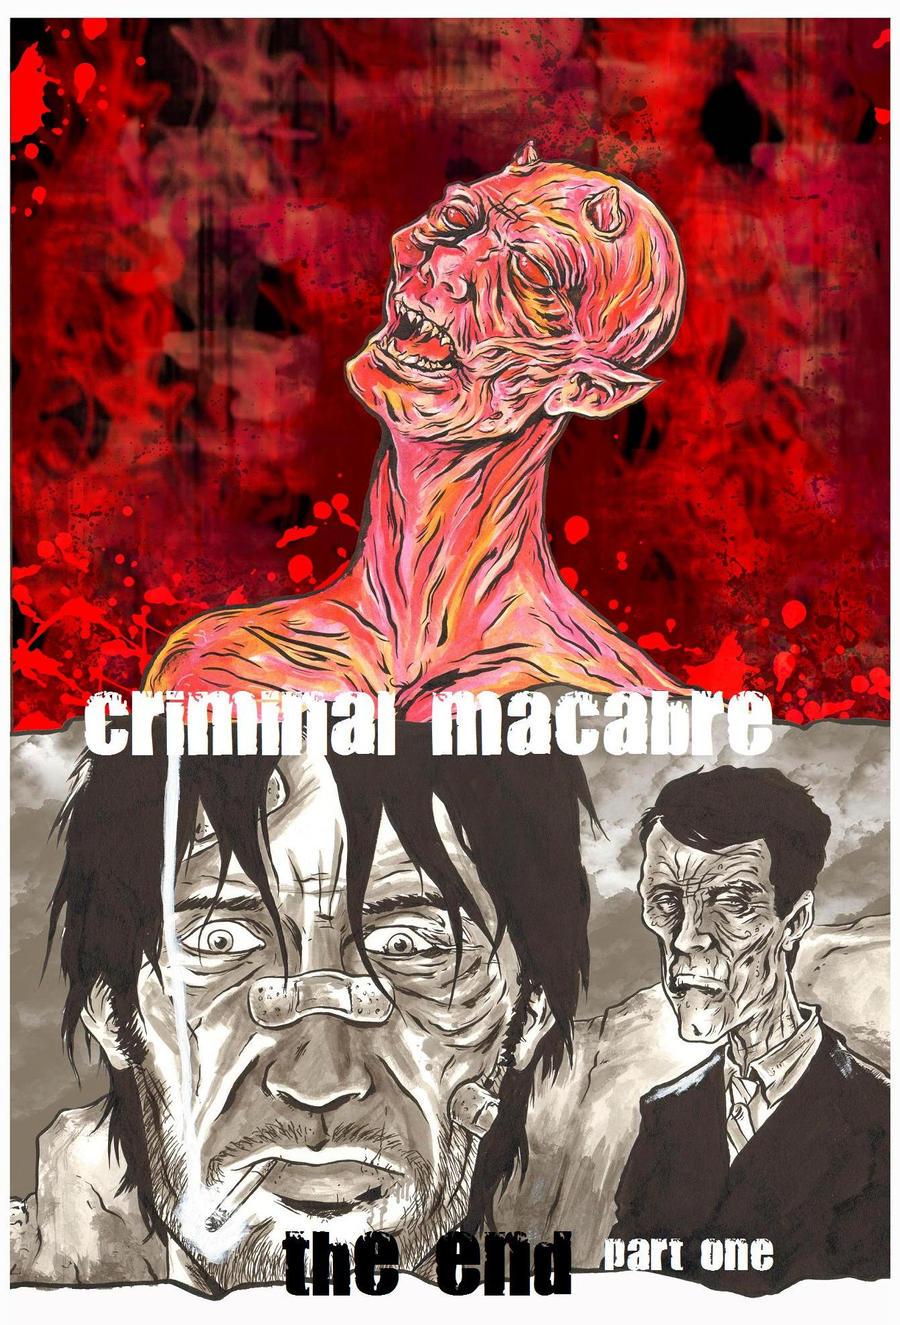 Criminal Macabre tribute